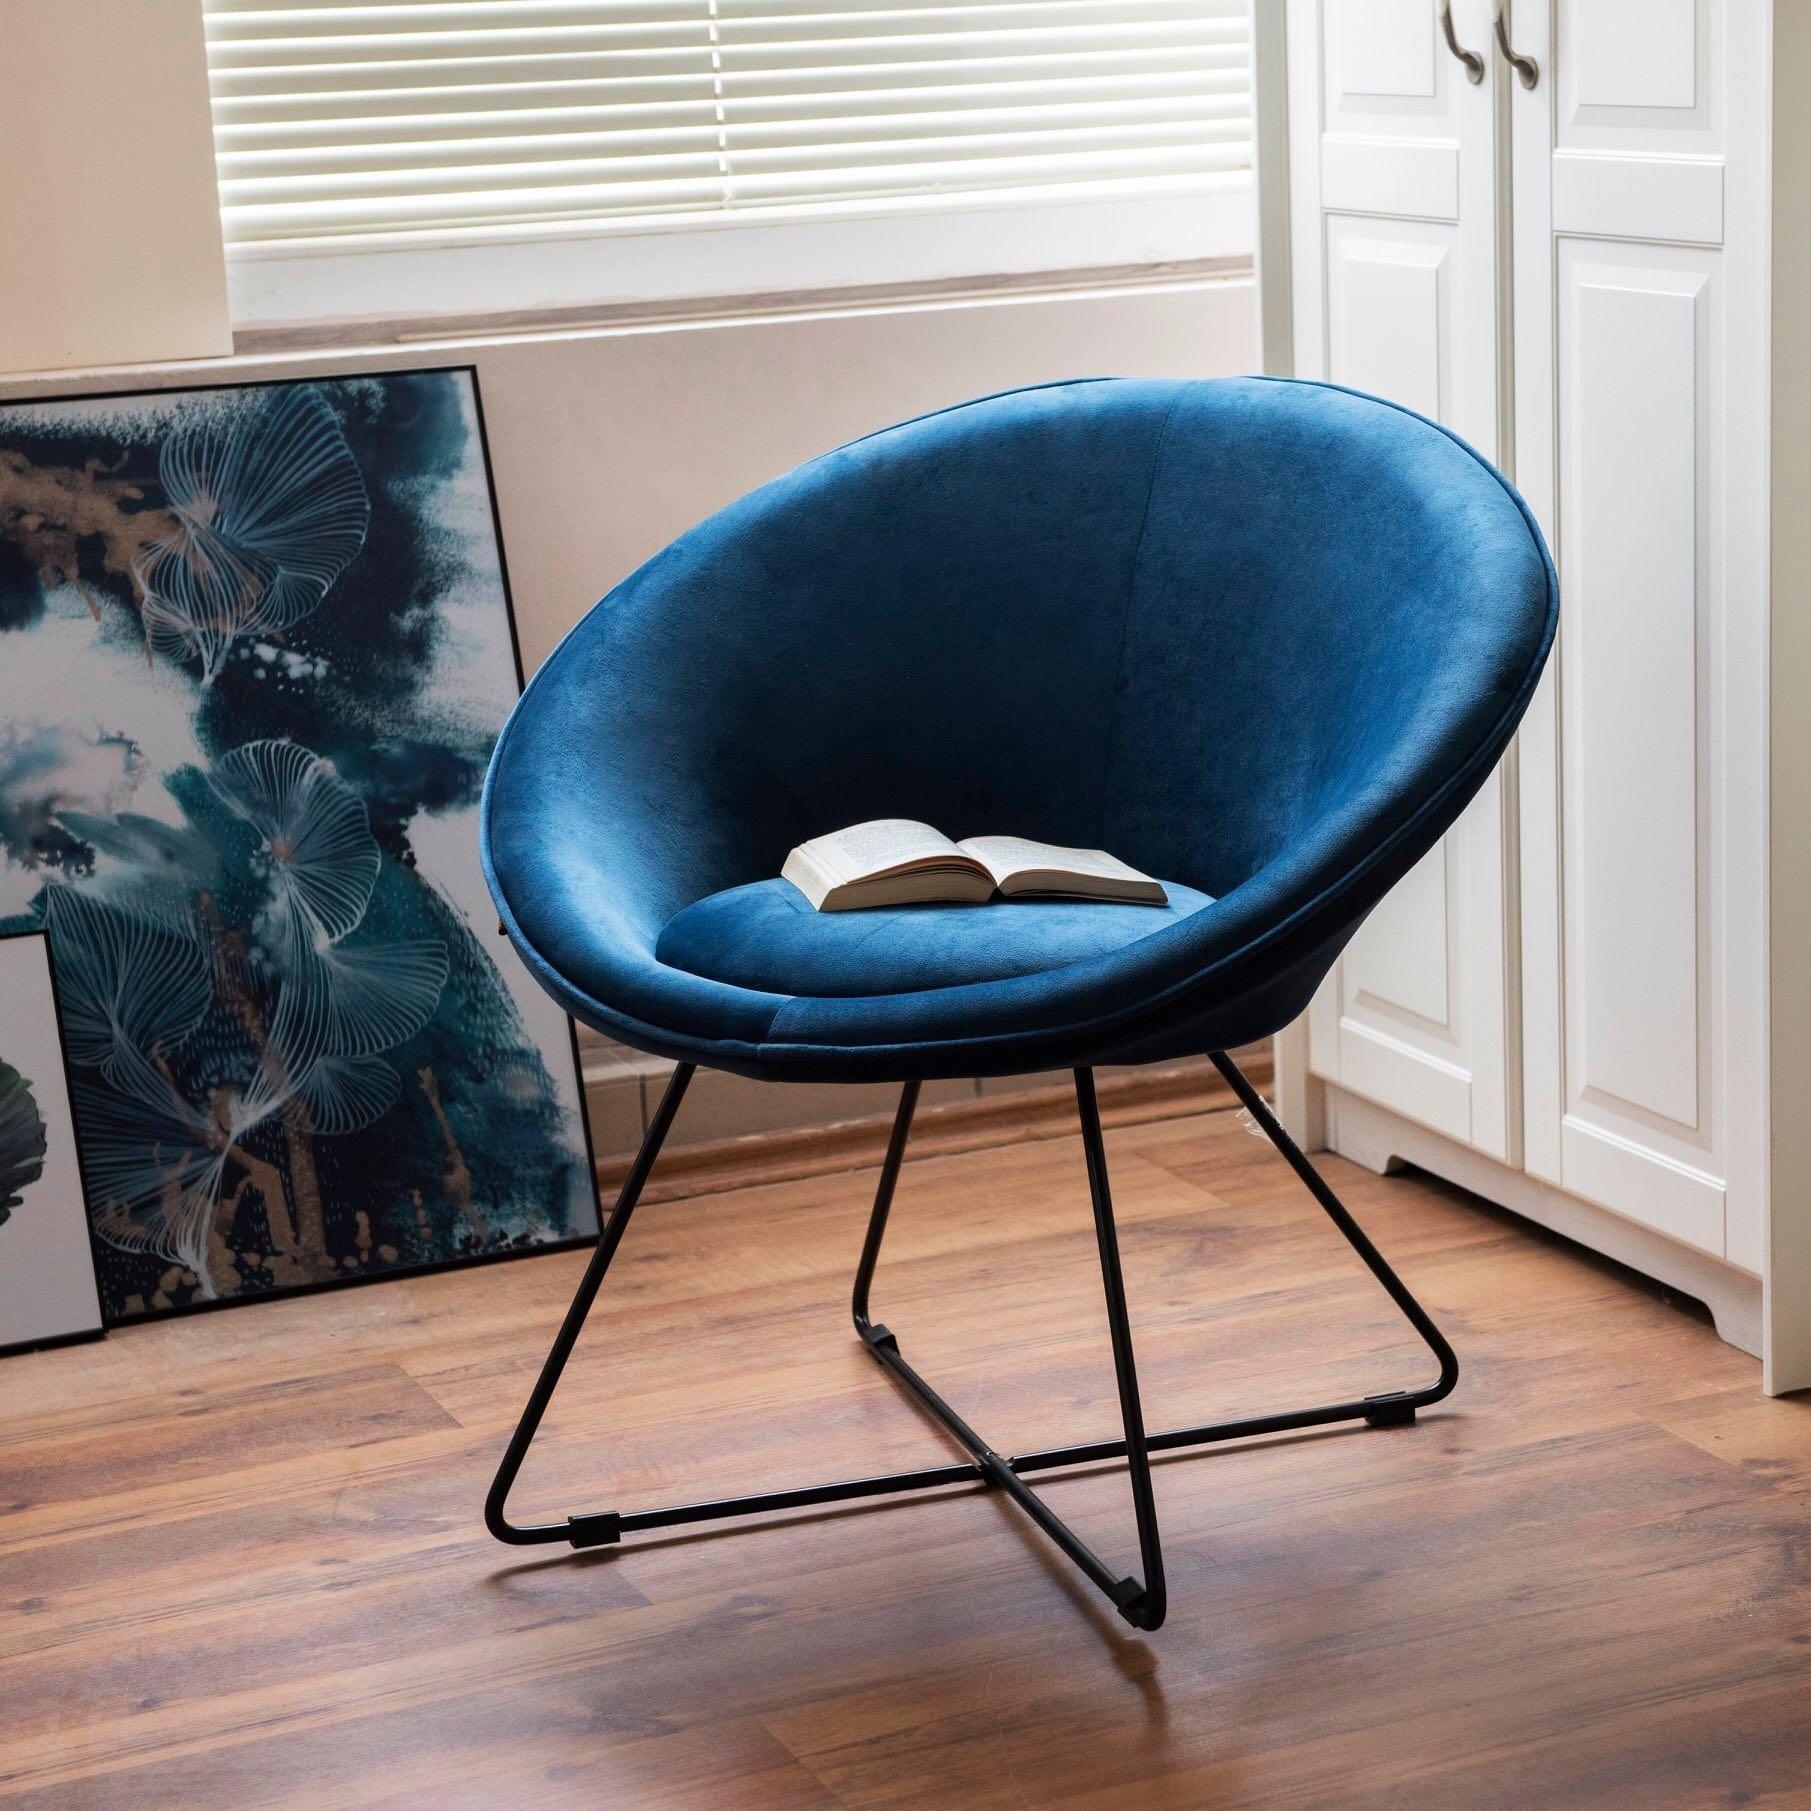 Modern kerek fotel, középkék - OVNI